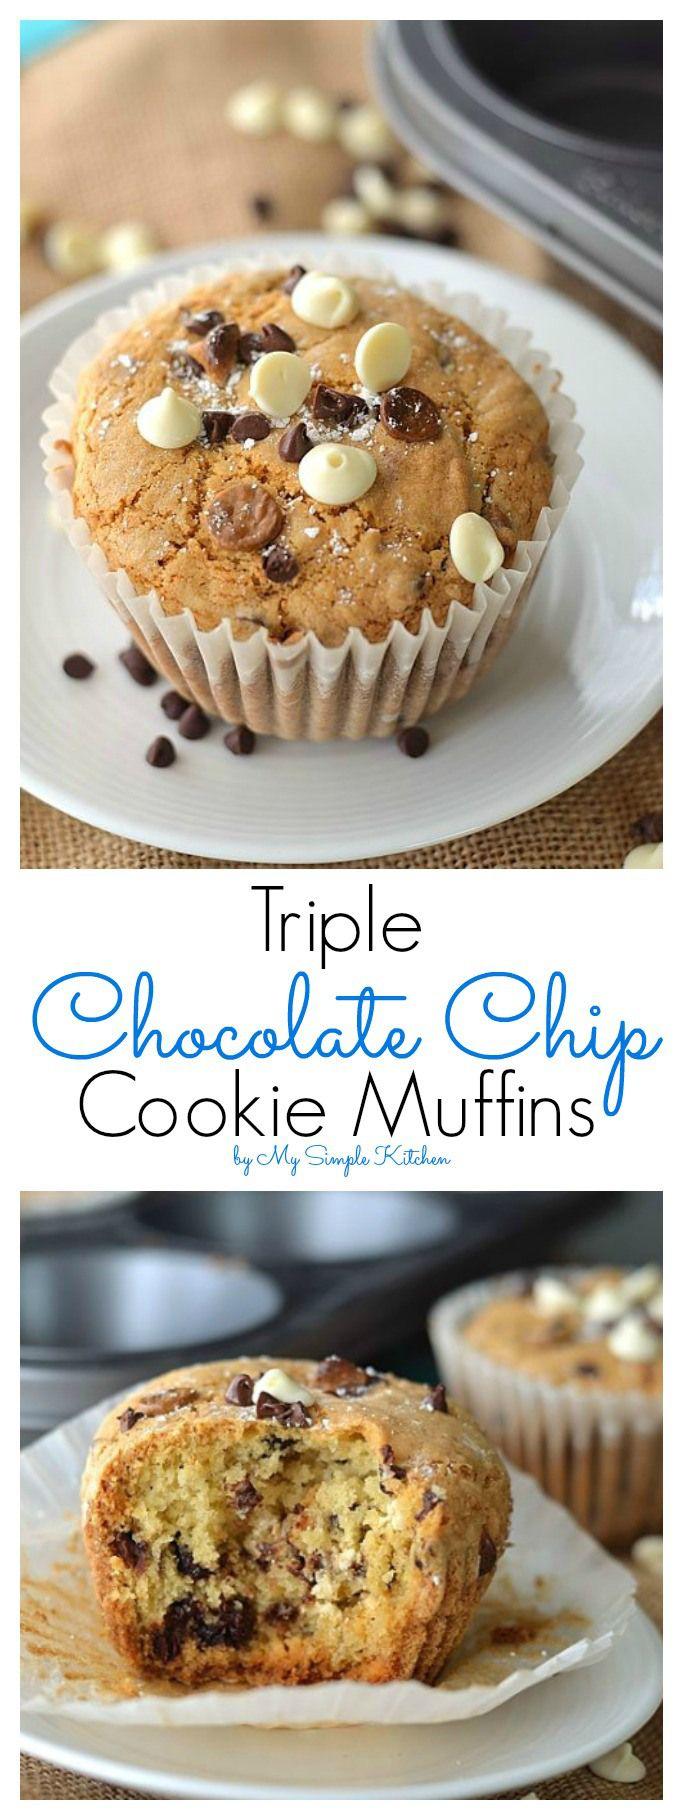 ... Pumpkin Spice Muffins, Chocolate Chip Muffins and Vegan Banana Muffins